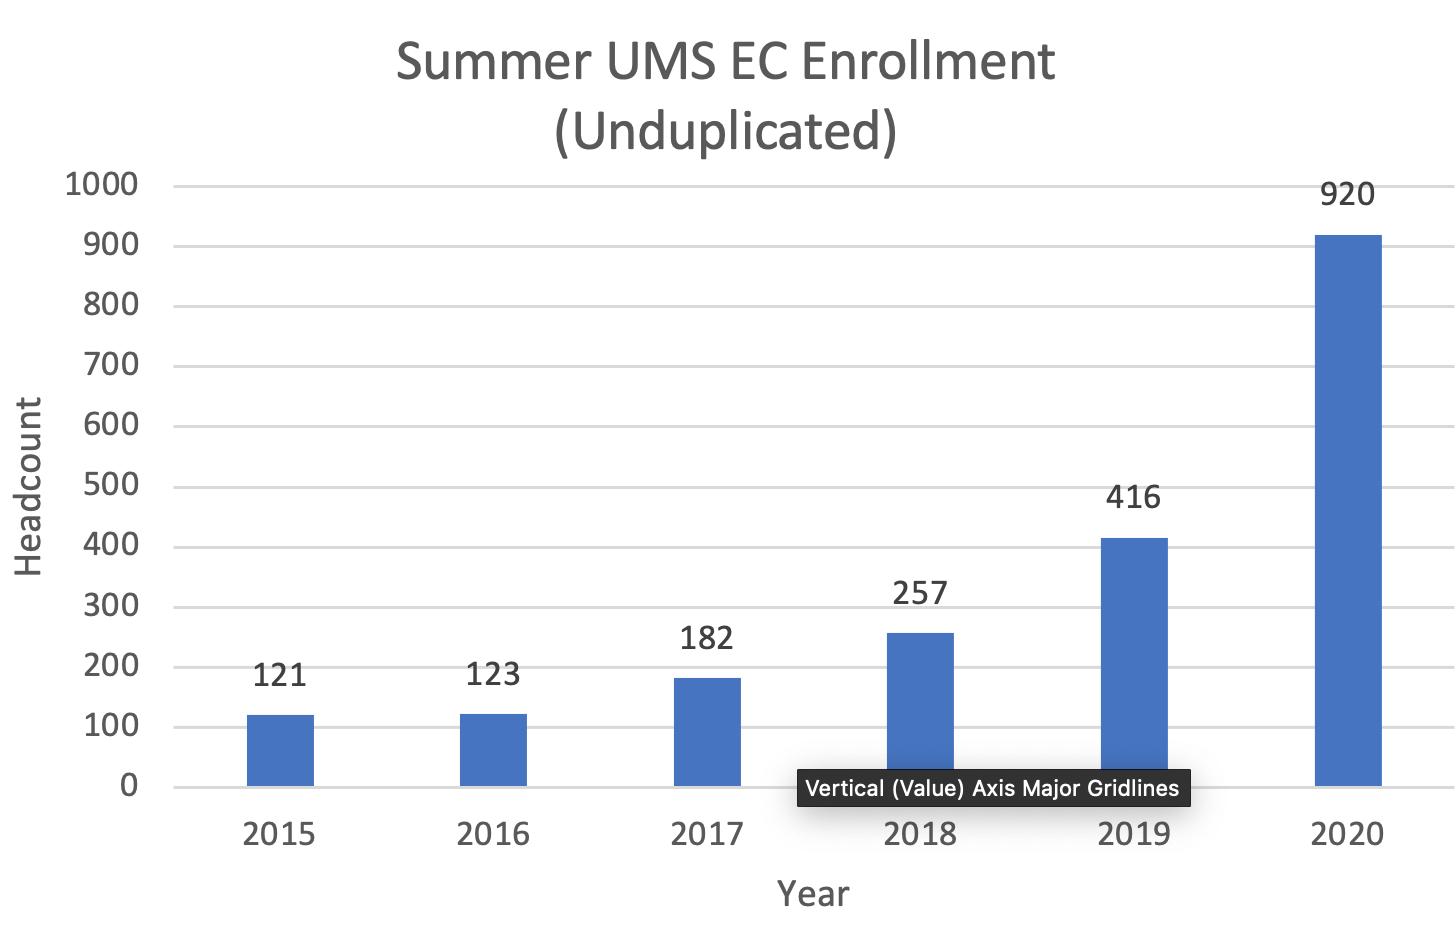 Summer UMS EC Enrollment (Unduplicated) - Text-only description linked below